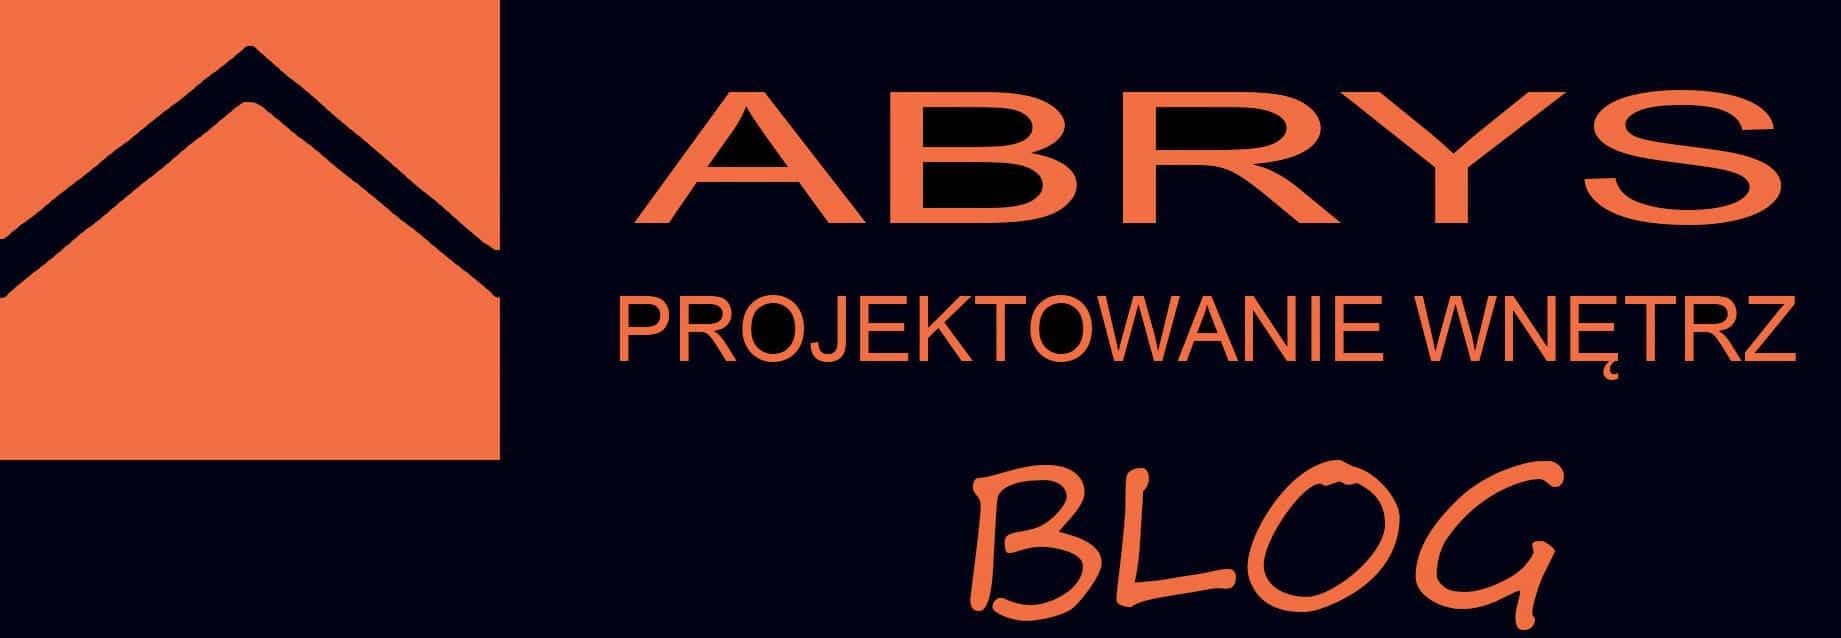 logo bloga Abrys